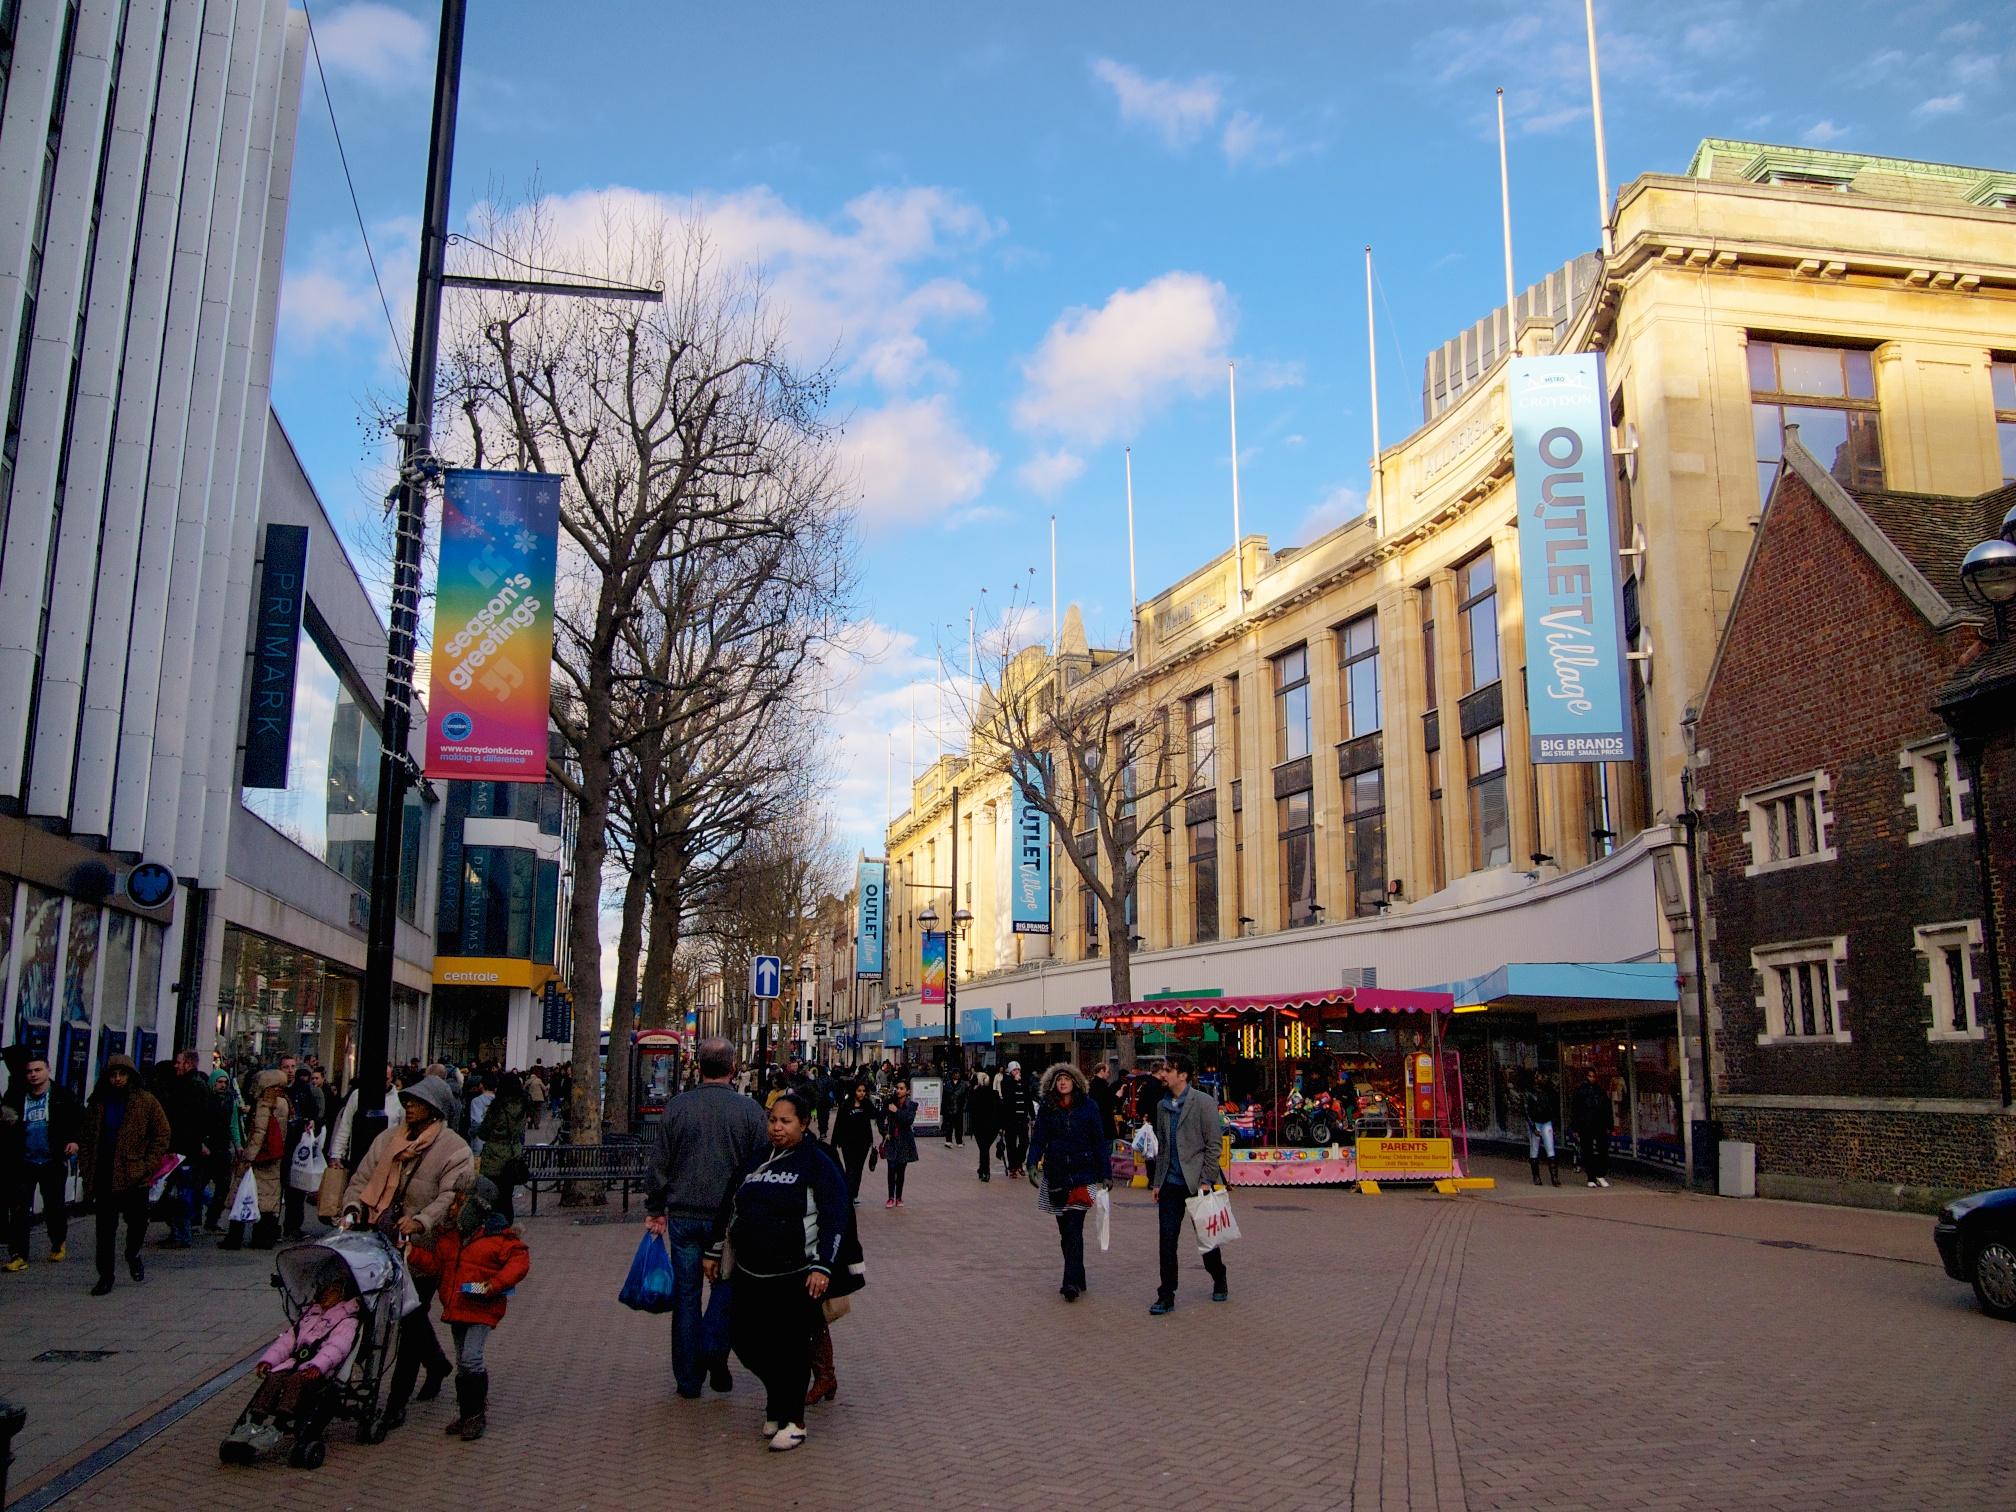 UK – Day 11: Gaan dahn ta Croydon, innit